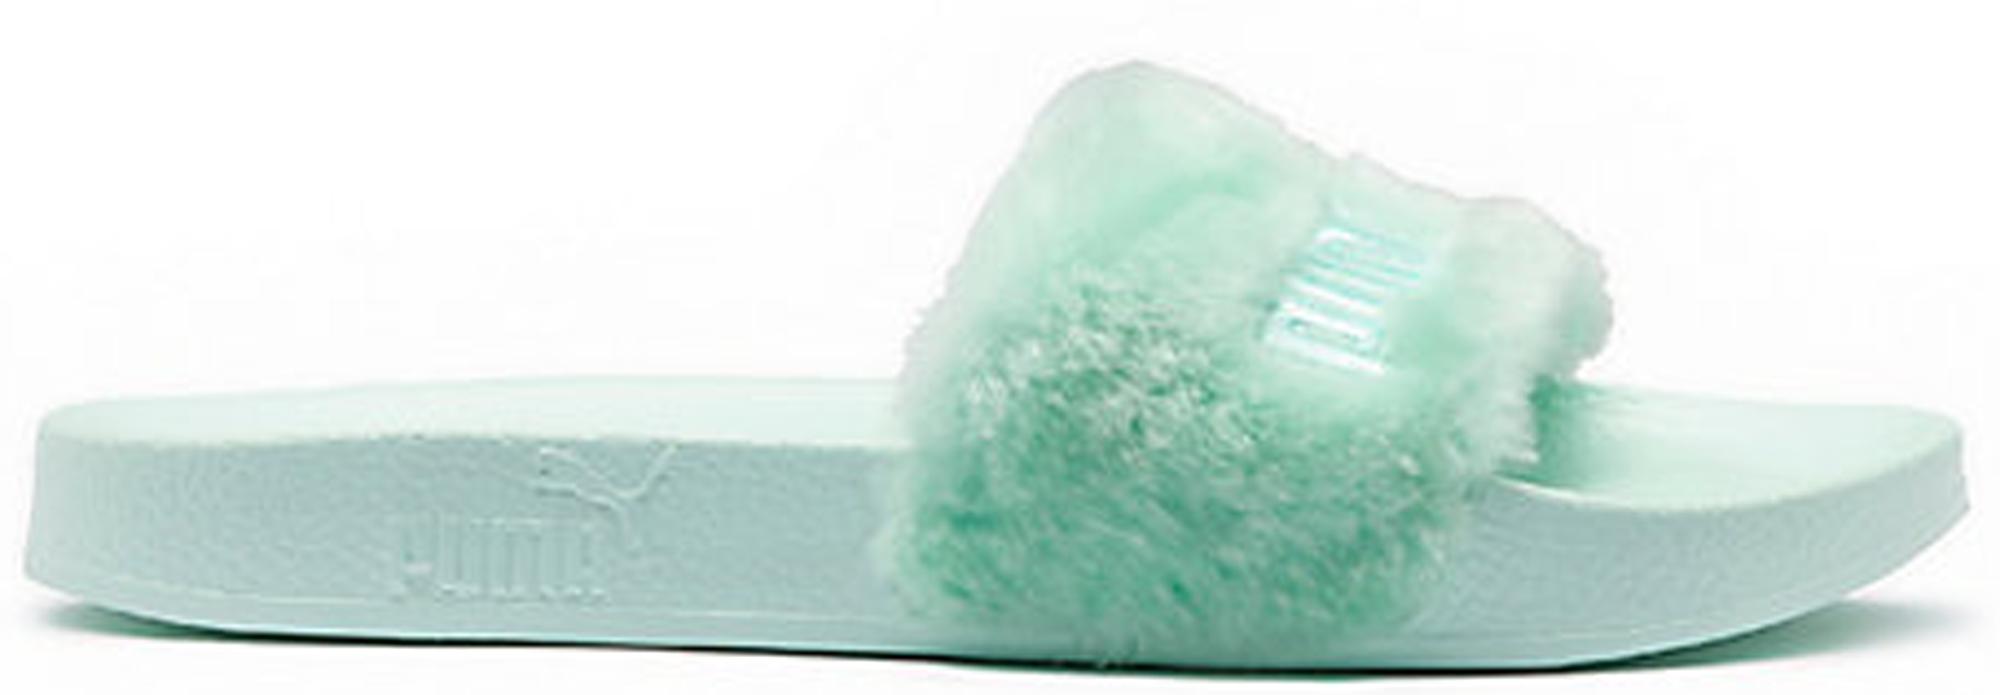 Puma Fur Slide Rihanna Fenty Bay Mint (W)